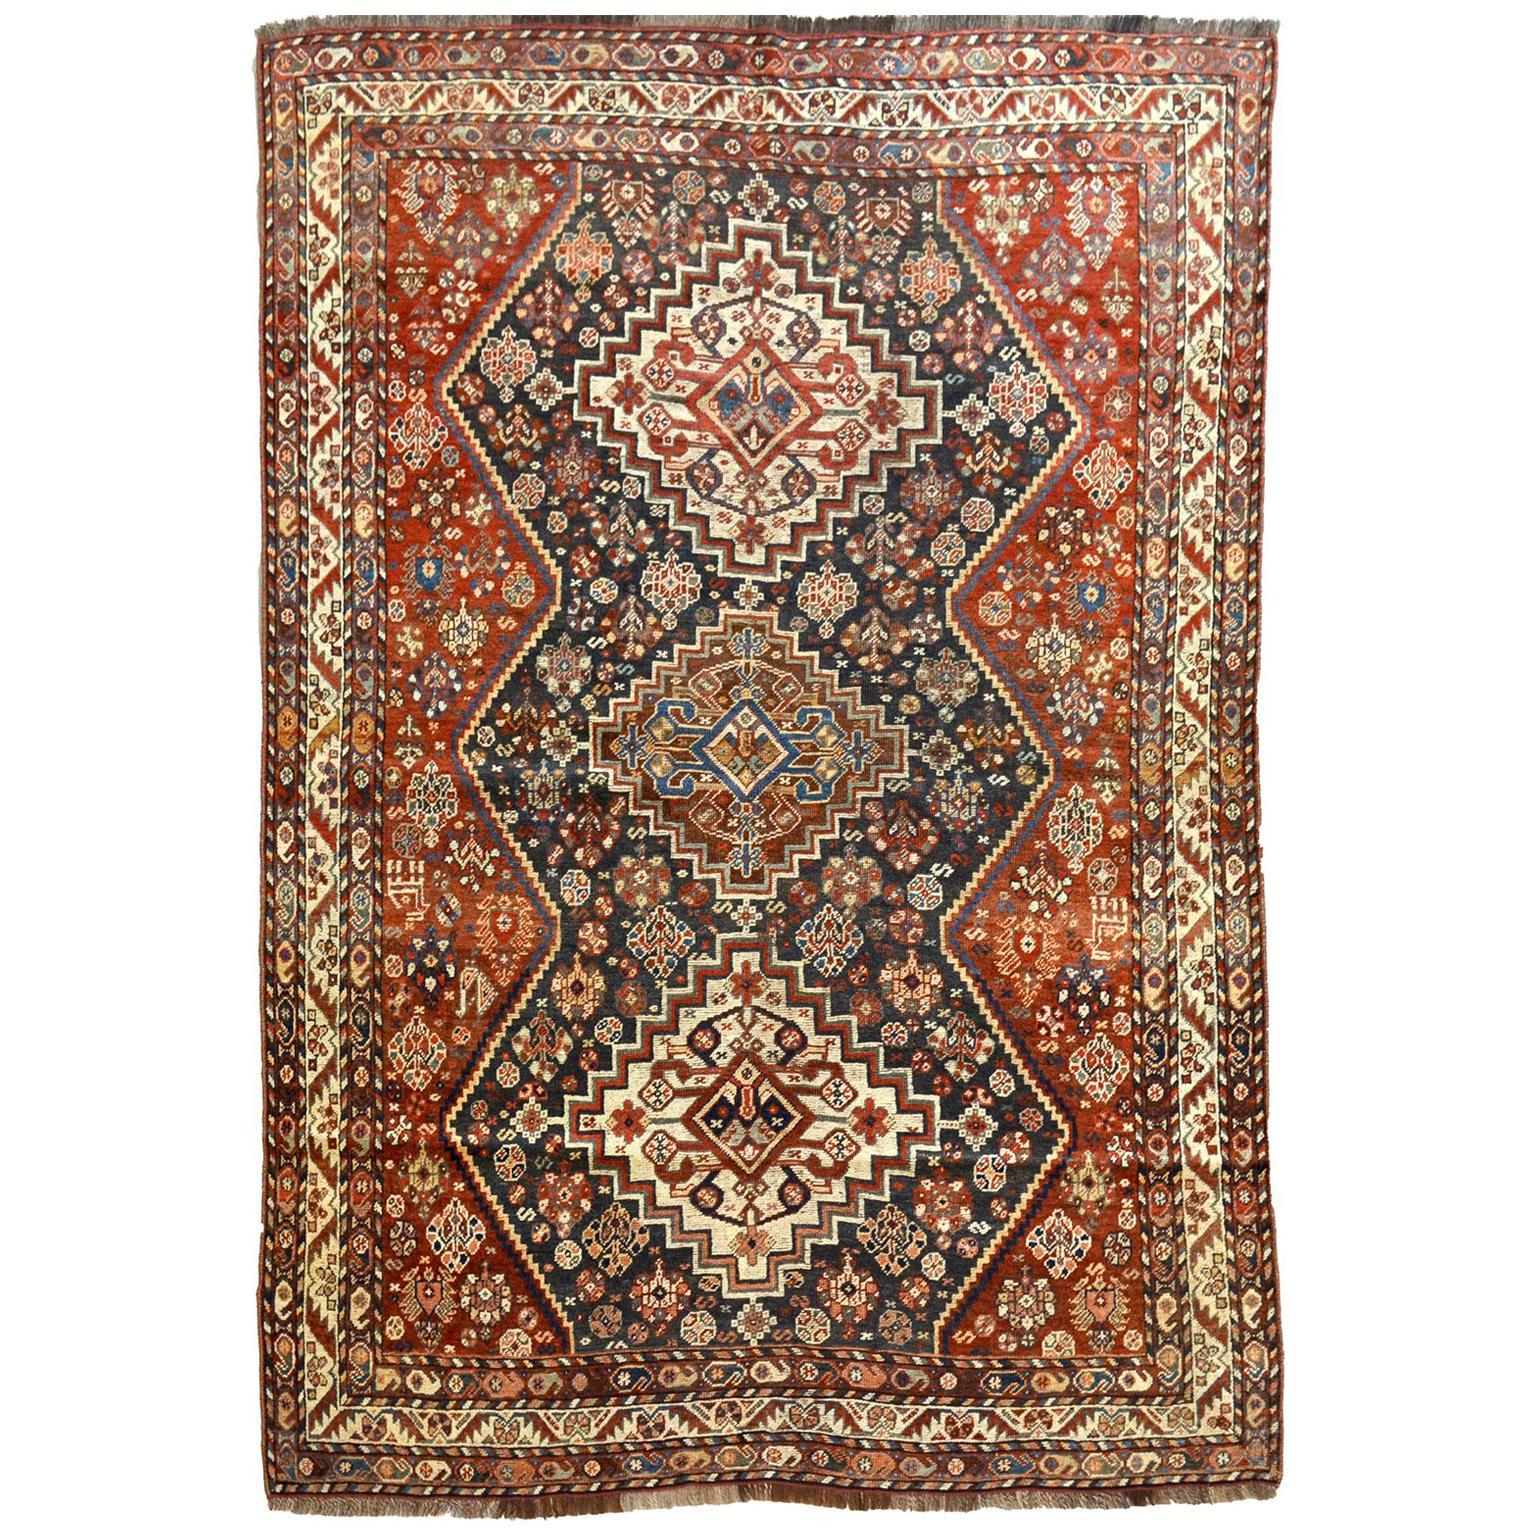 Persian Qashqai Carpet, circa 1880 in Pure Handspun Wool and Vegetable Dyes